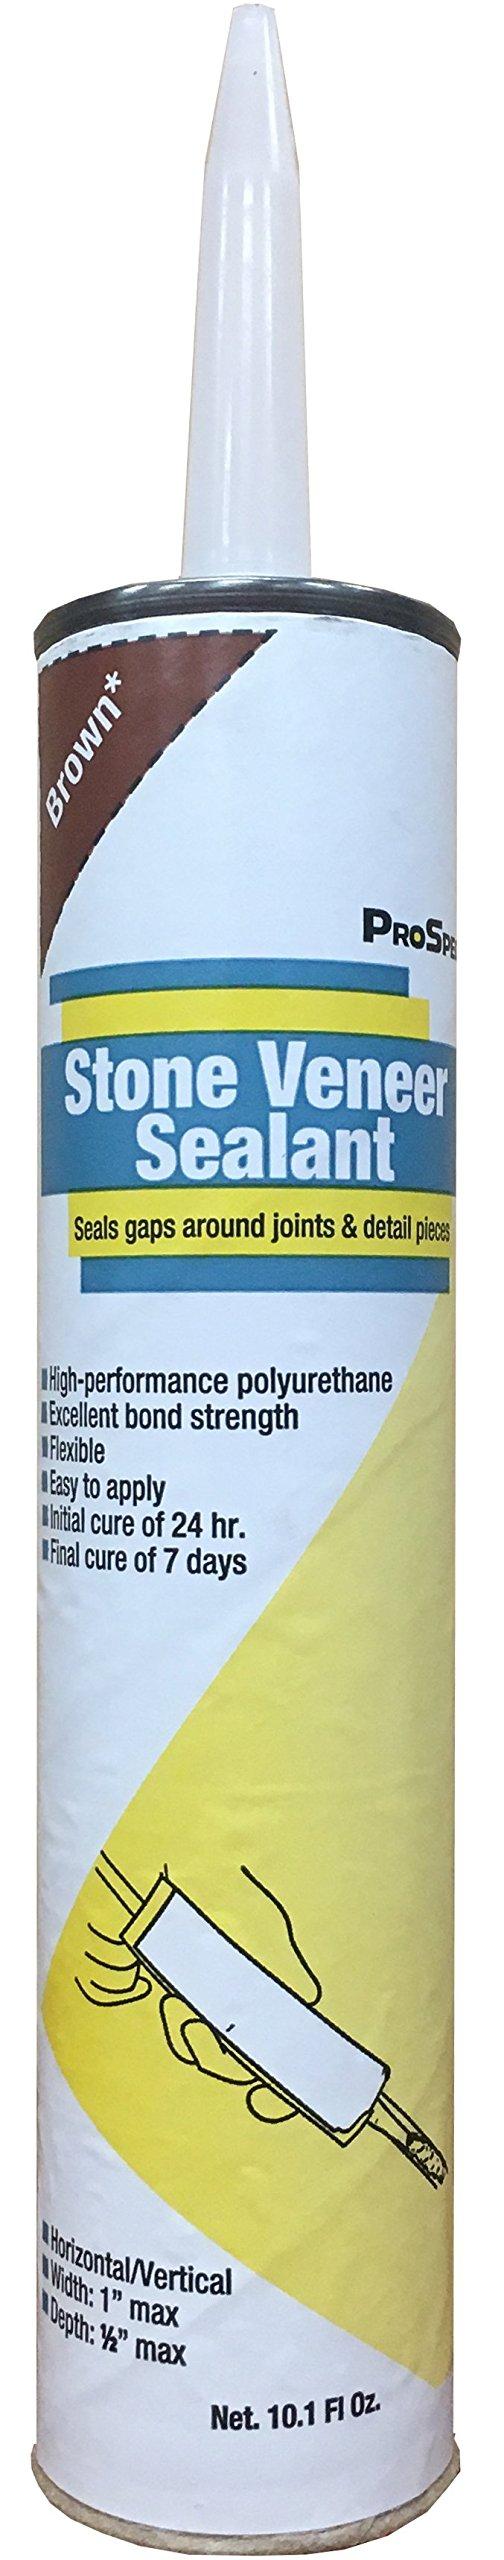 ProSpec Stone Veneer Sealant - Brown - 10.1 oz. (3 Pack) by ProSpec